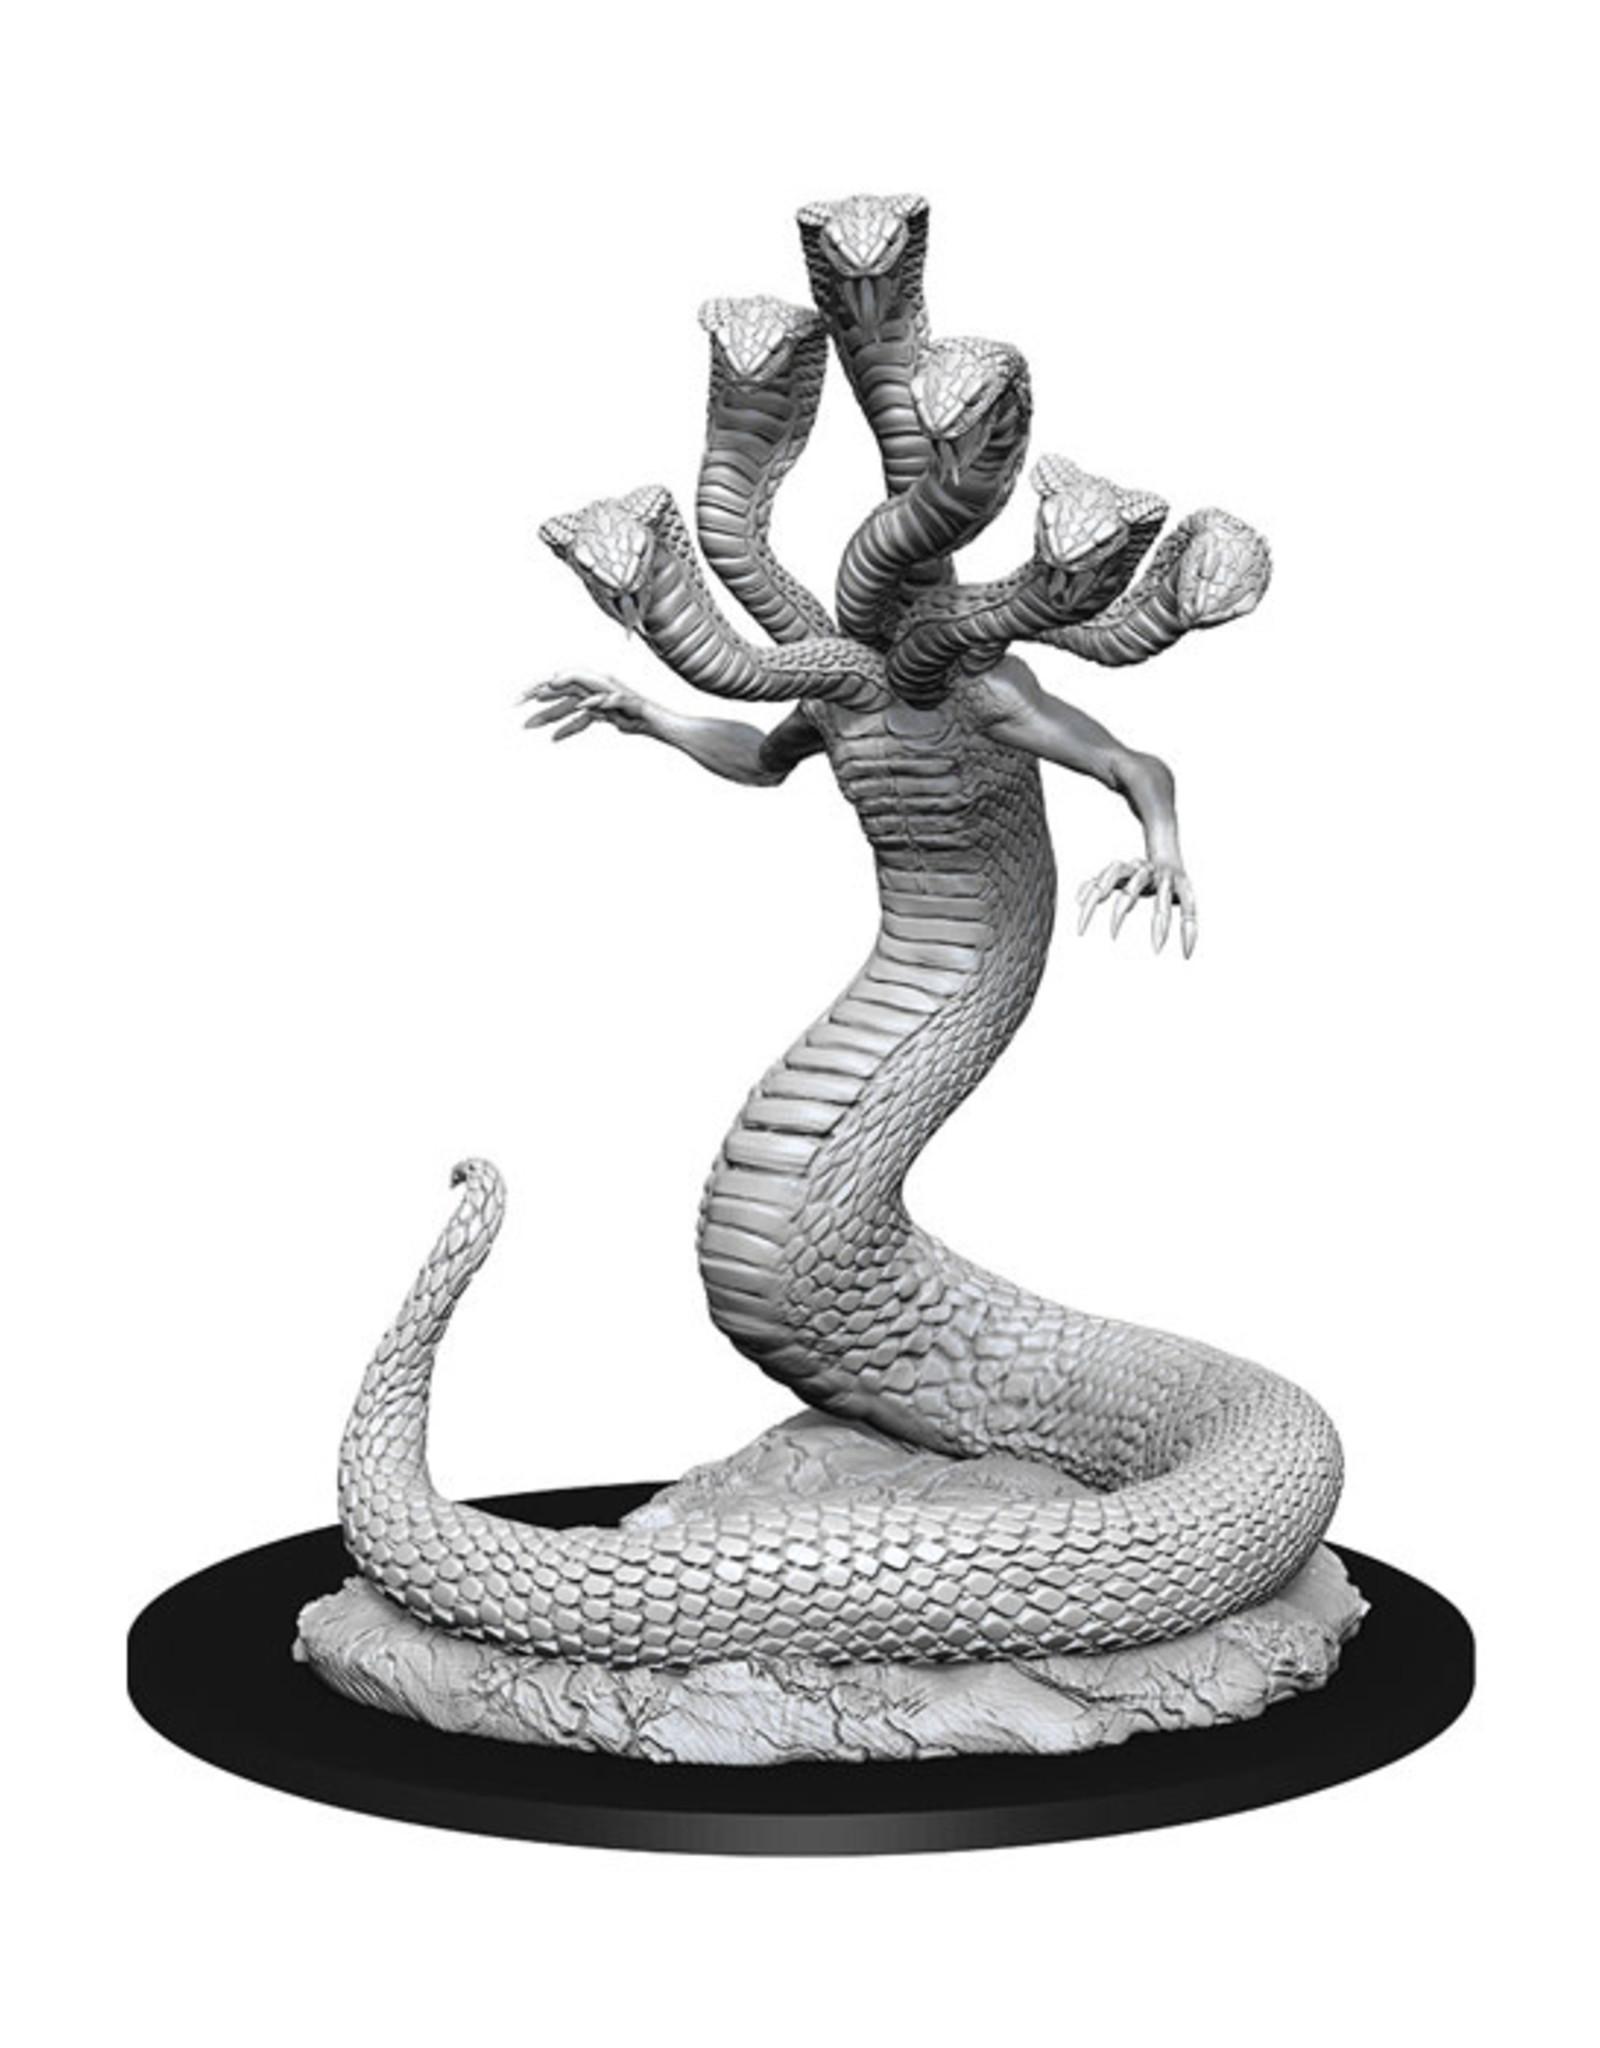 Dungeons & Dragons Dungeons & Dragons: Nolzur's - Yuan-Ti Anathema